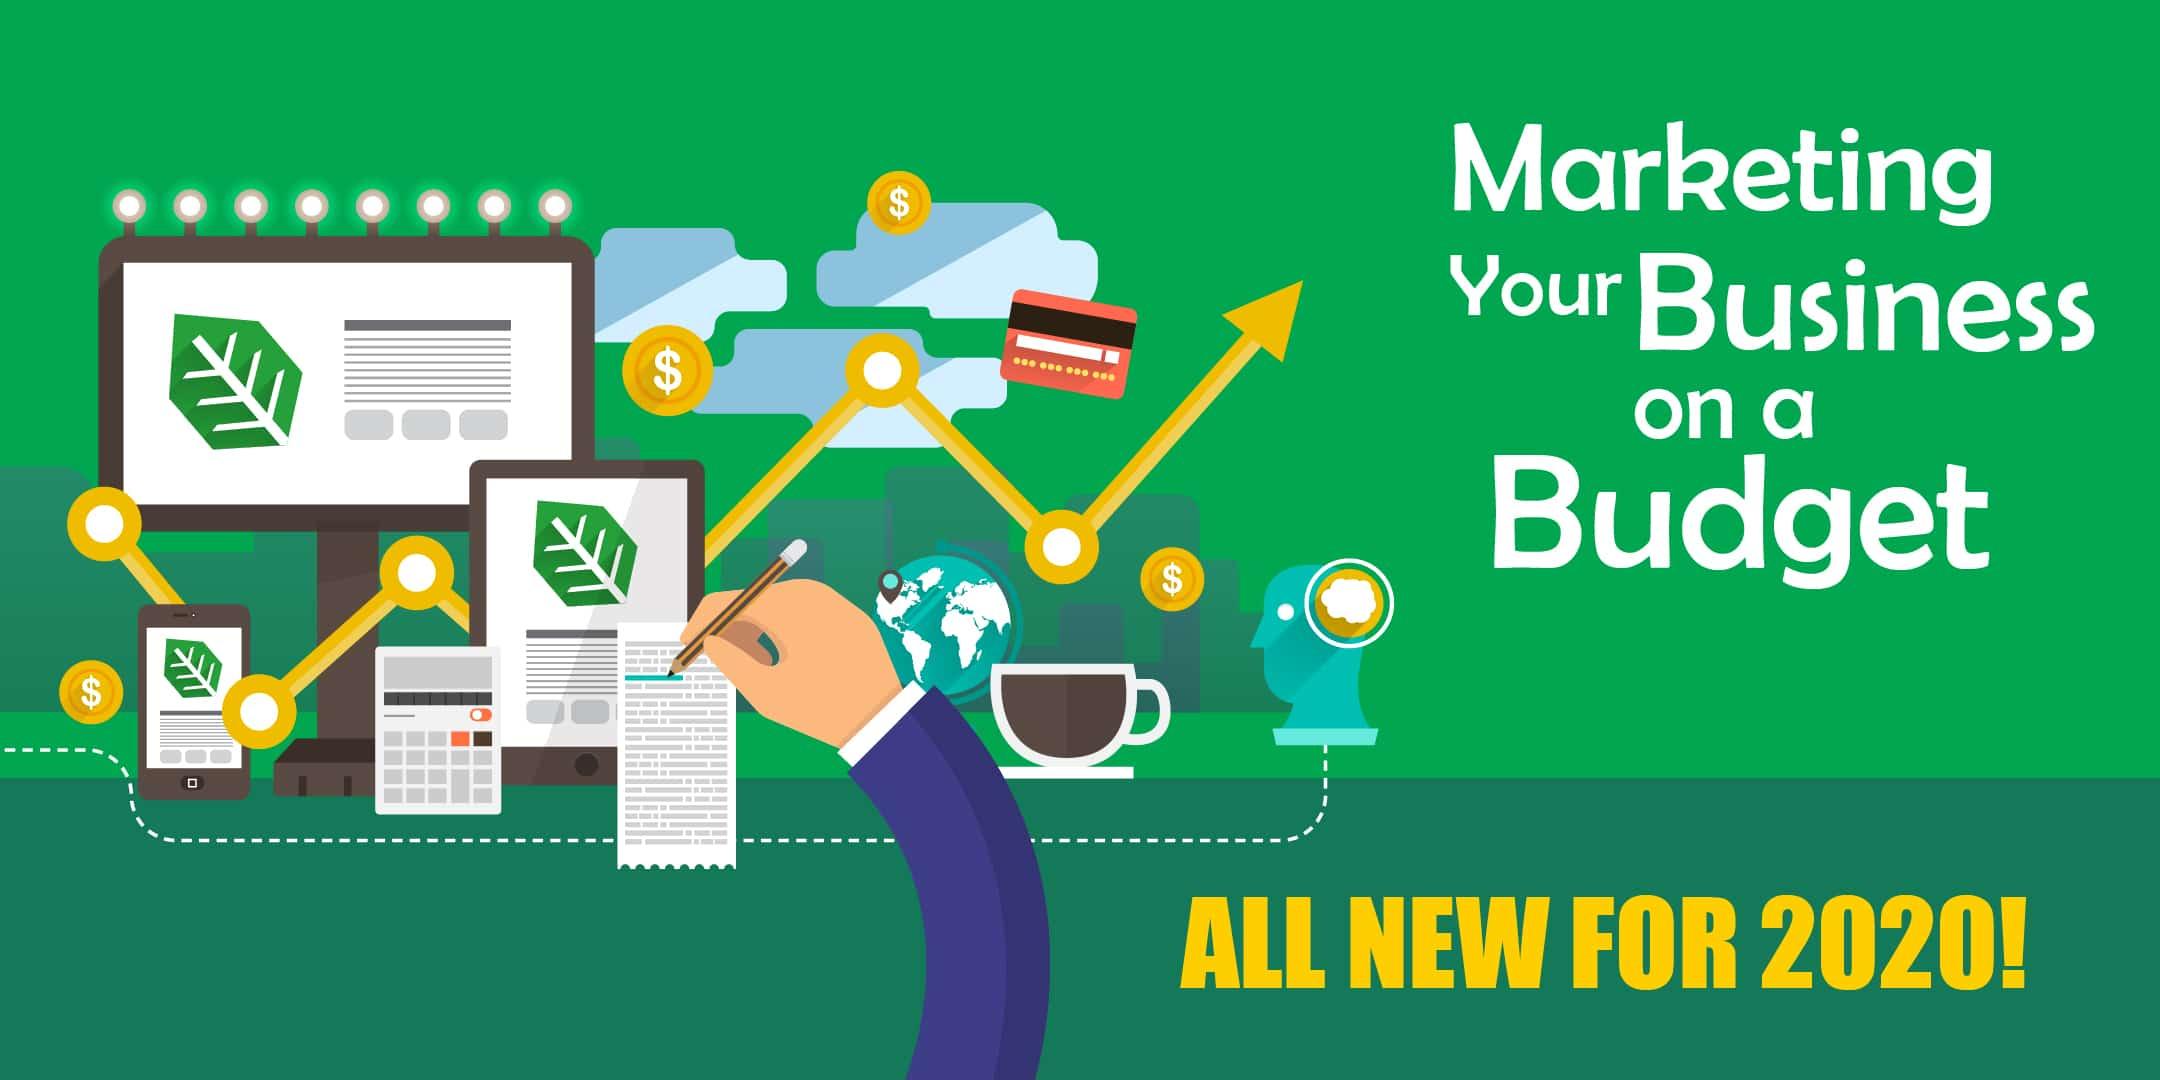 marketingYourBusinessOnaBudget-Eventbrite-Header 2020